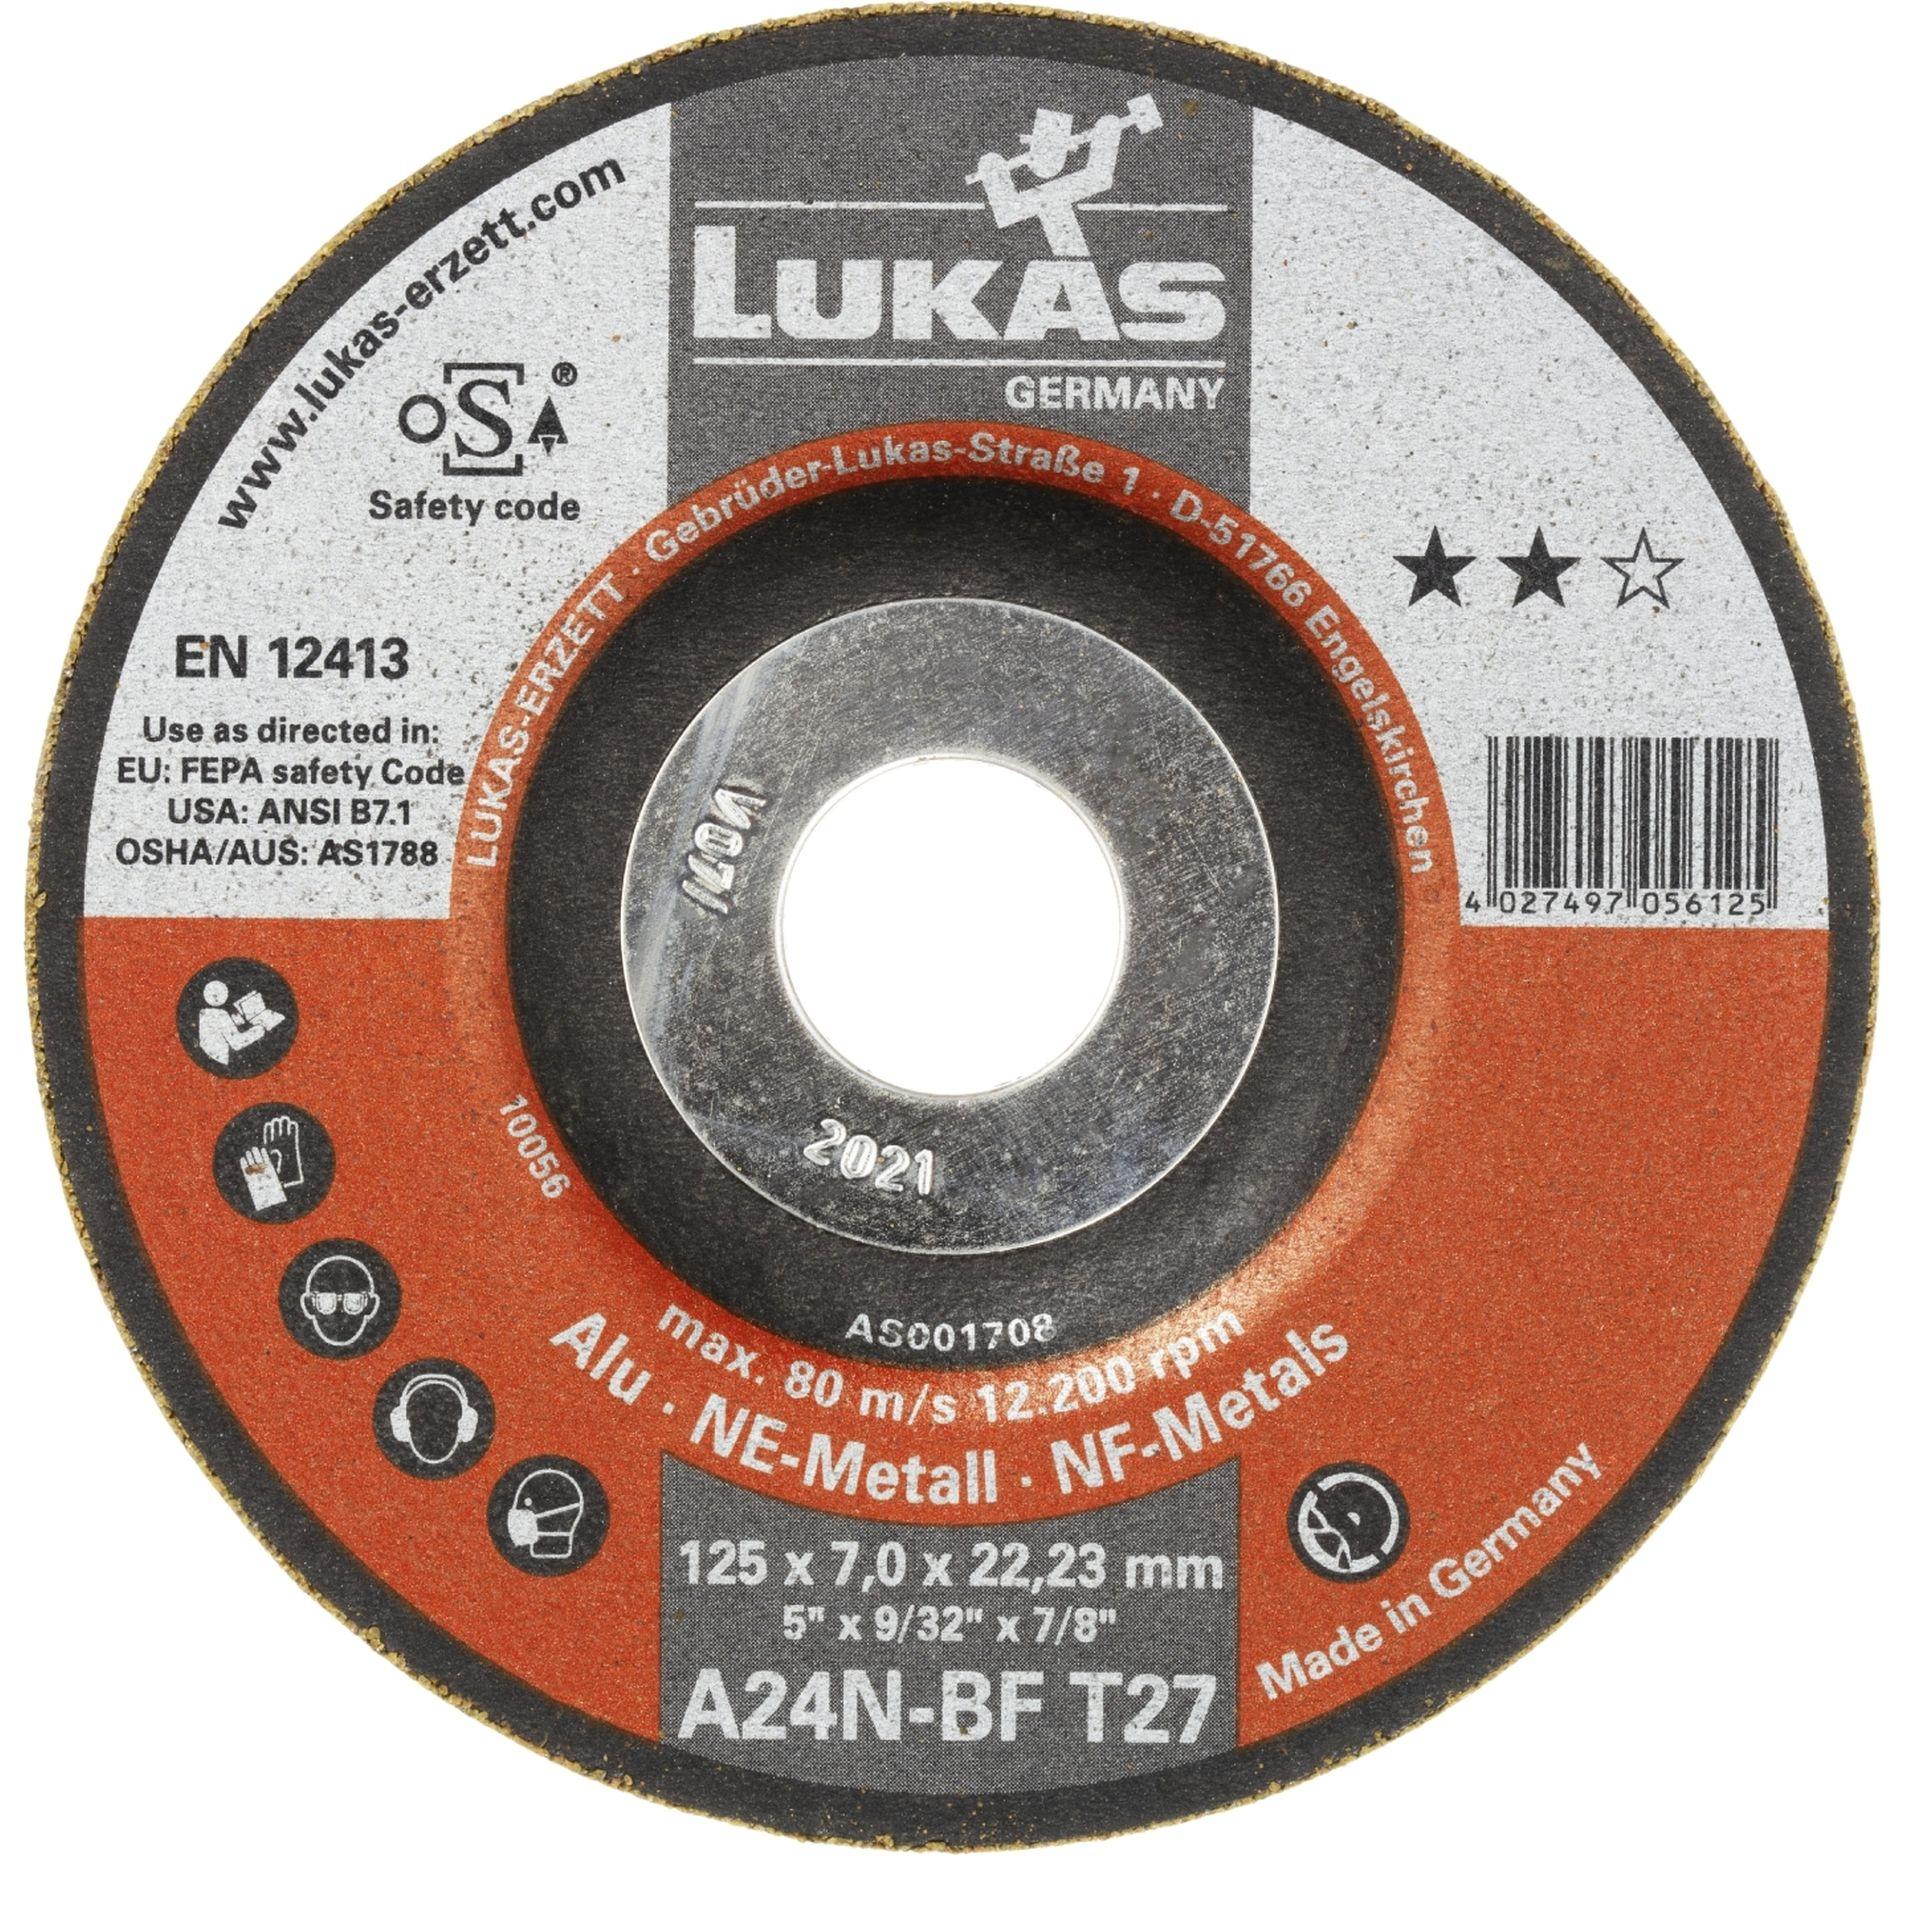 10x LUKAS Schruppscheibe Schruppscheiben T27 Alu 125x7 mm gekröpft A24N-BF